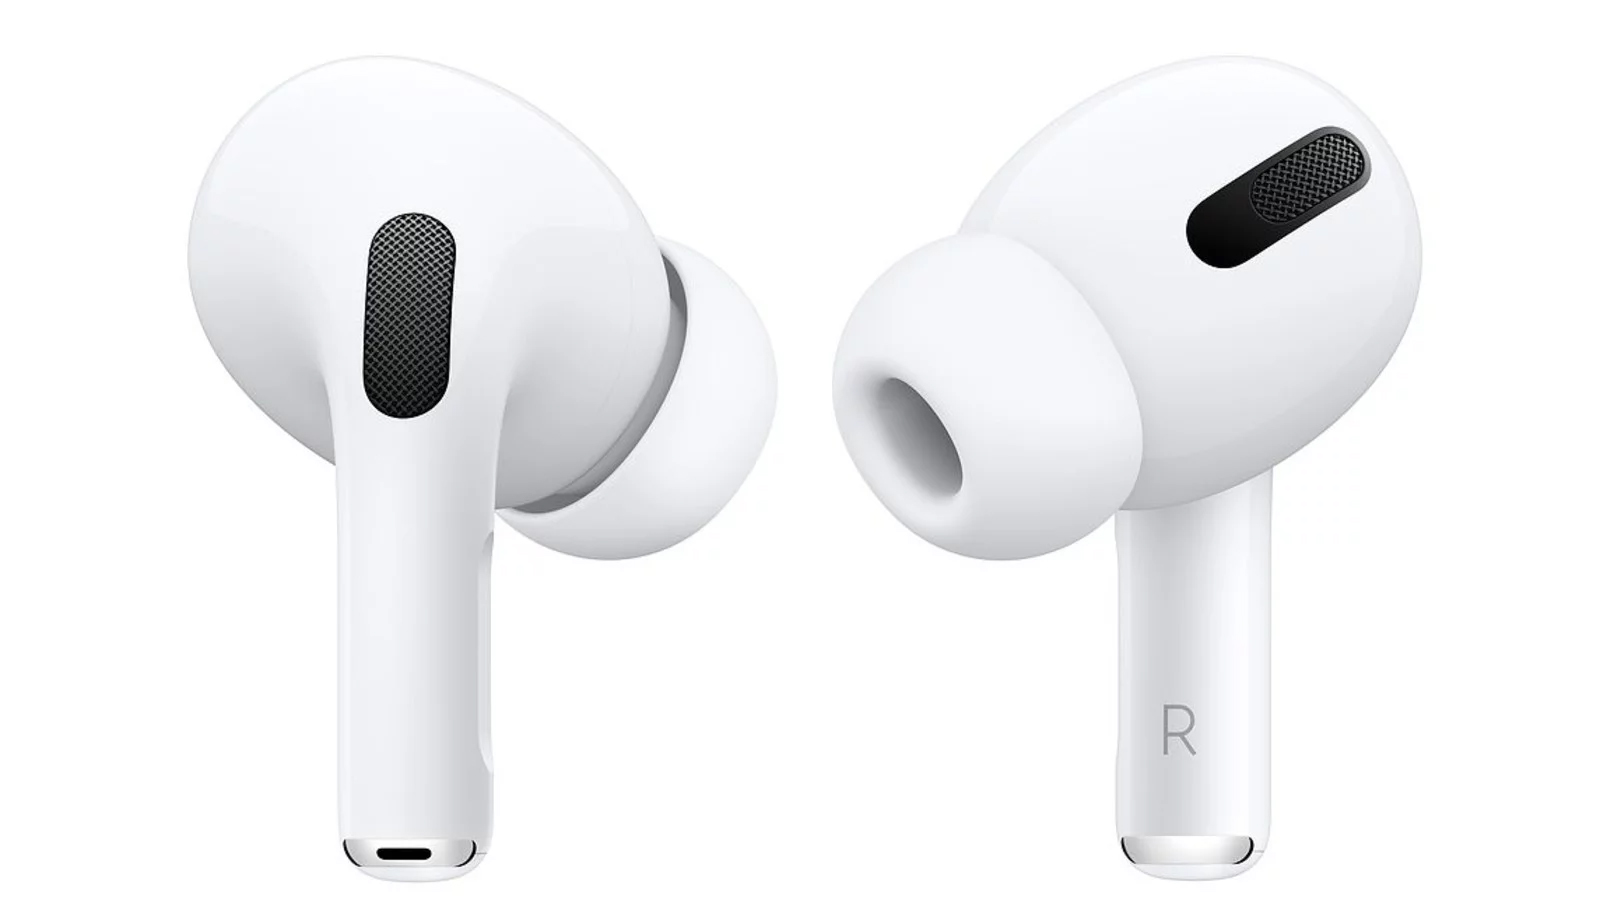 Apple AirPods Pro Headphones